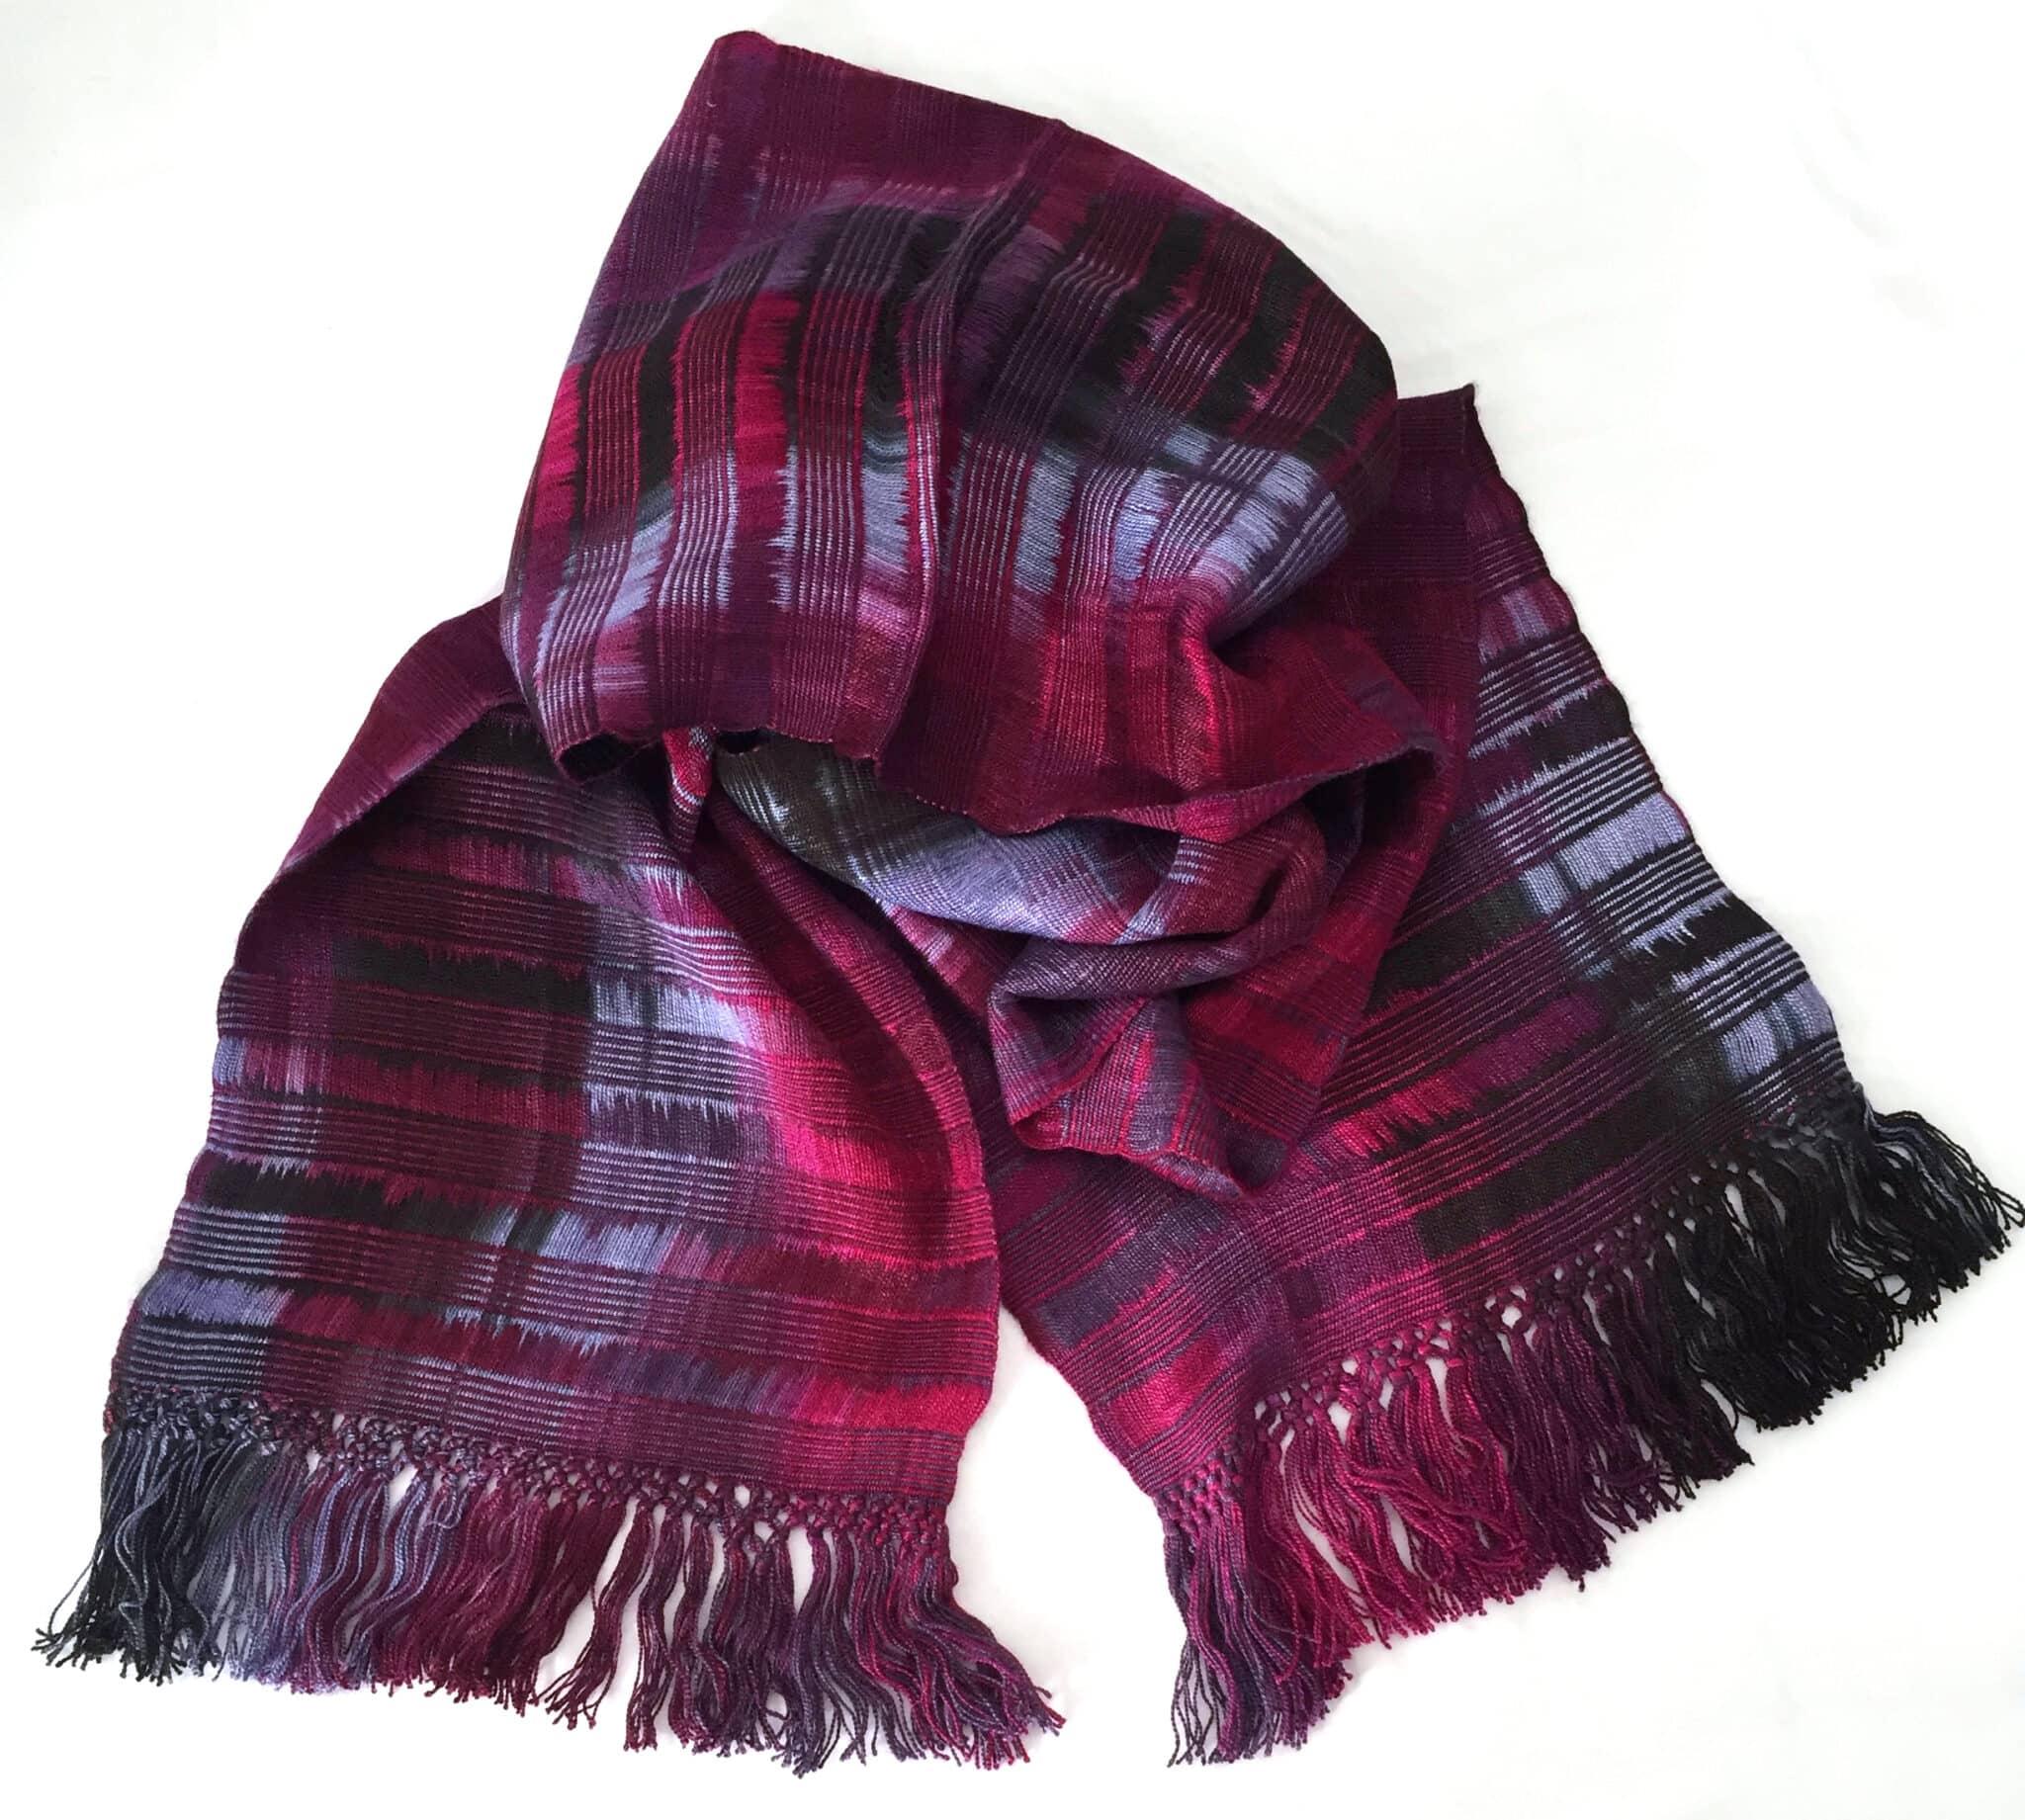 Magenta, Light Violet, Black - Lightweight Bamboo Open-Weave Handwoven Scarf 8 x 68